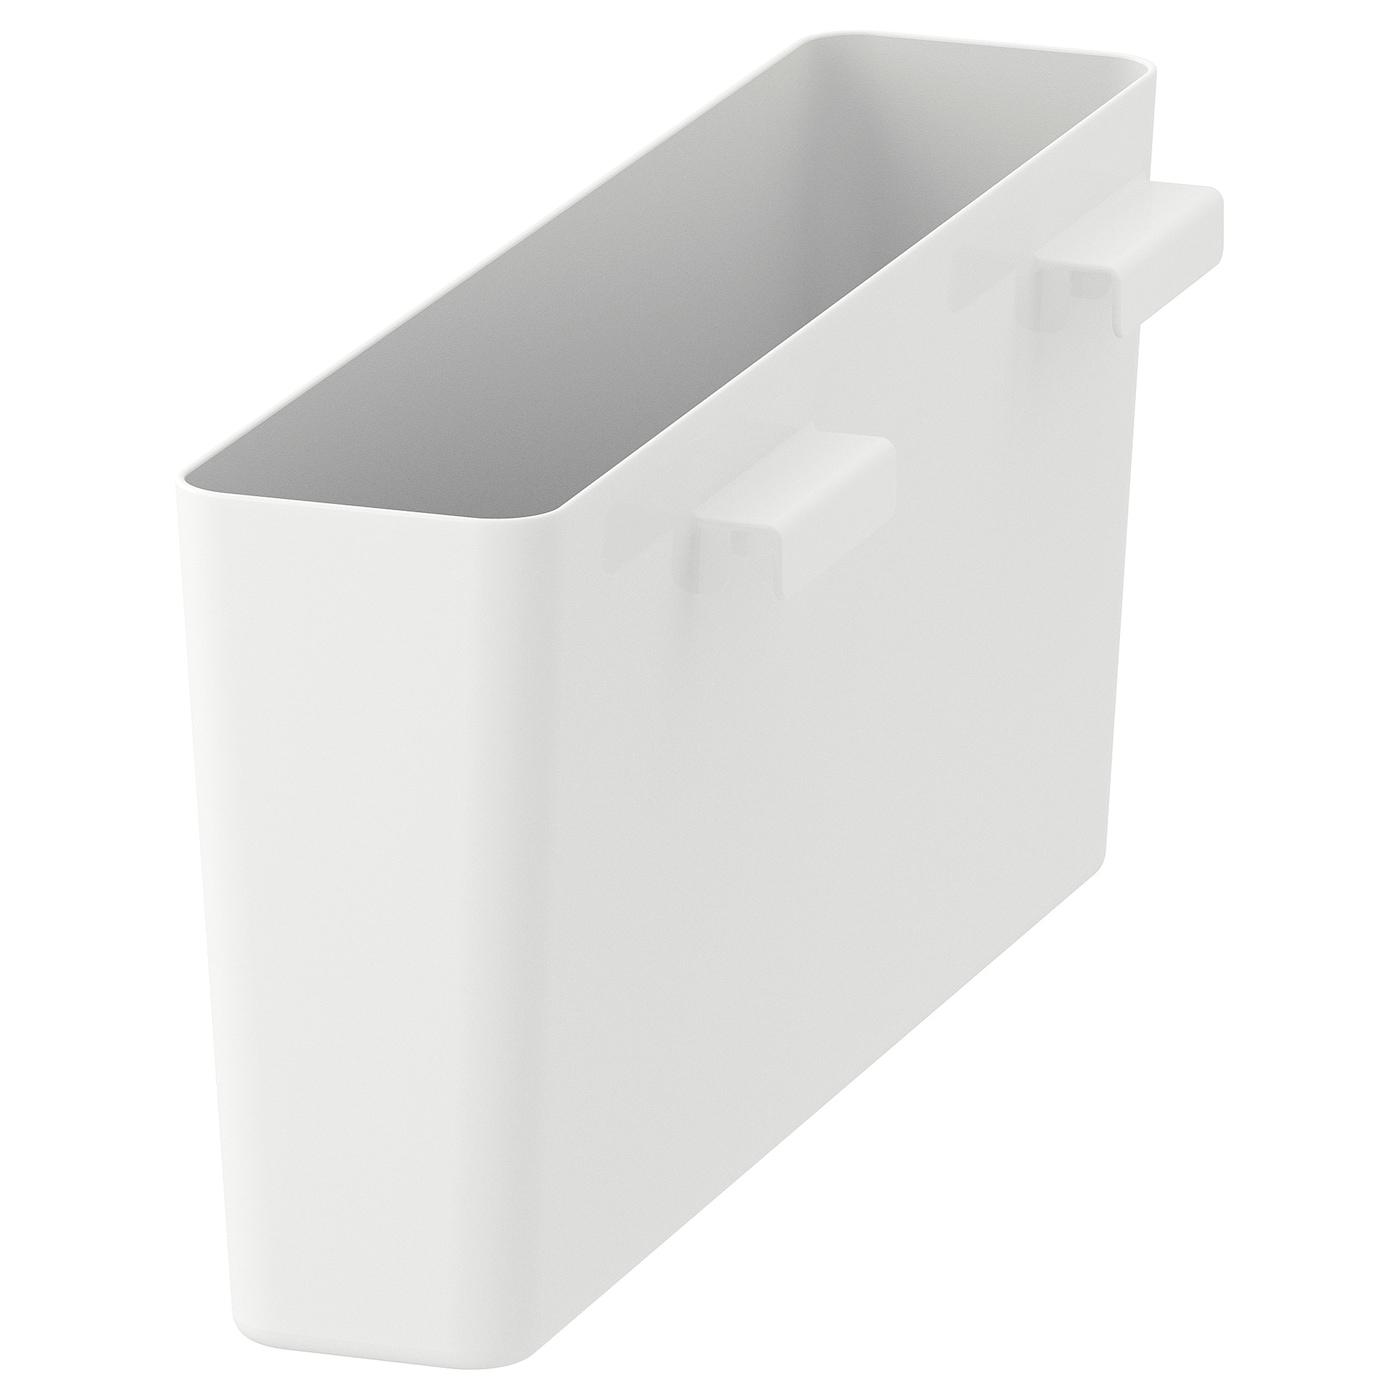 variera boîte de rangement brillant/blanc 50 x 12 cm - ikea